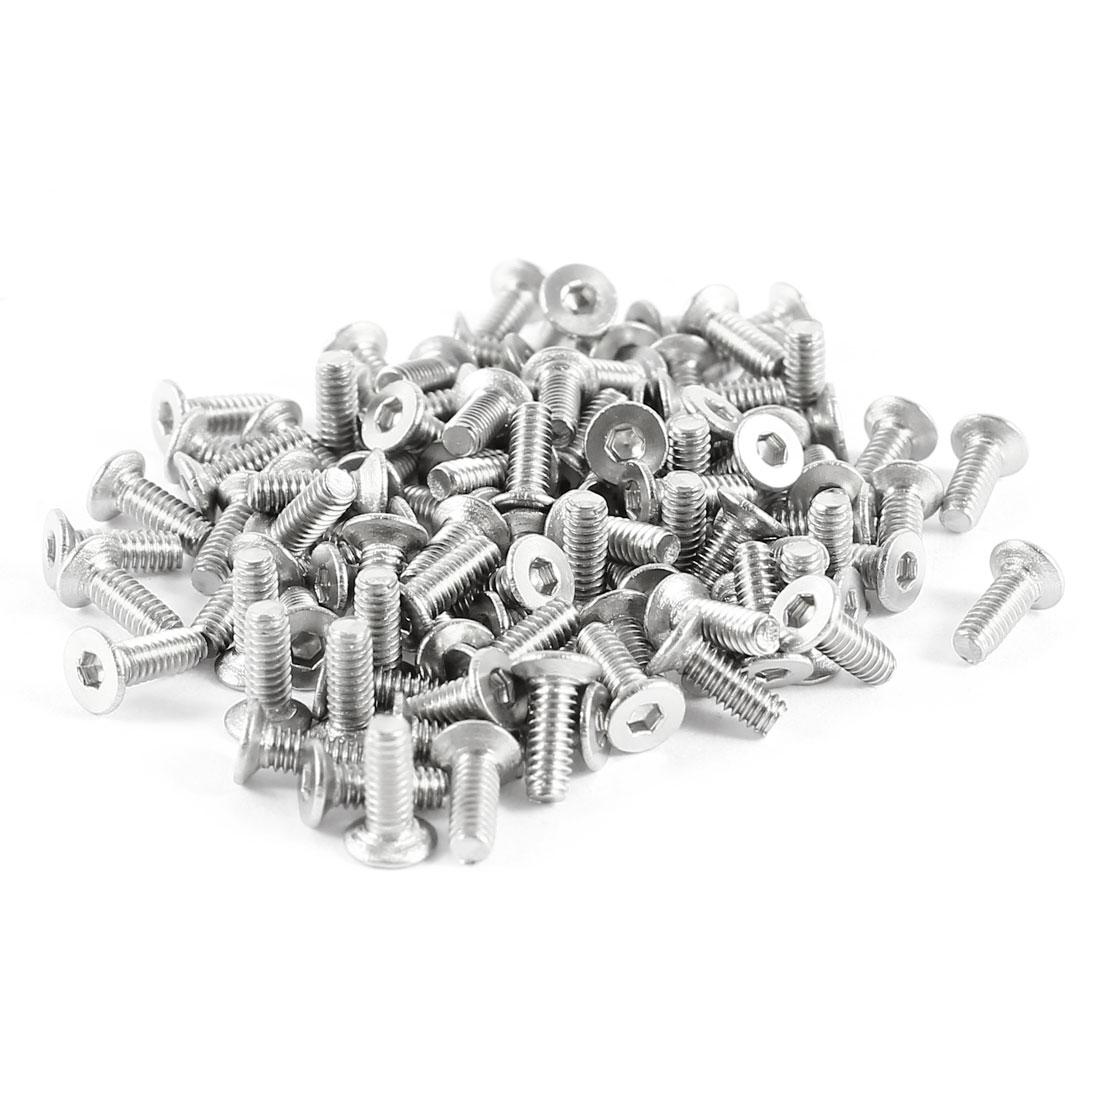 100 Pcs 304HC Stainless Steel Countersunk Hex Flat Head Key Bolts Screws M2 x 6mm